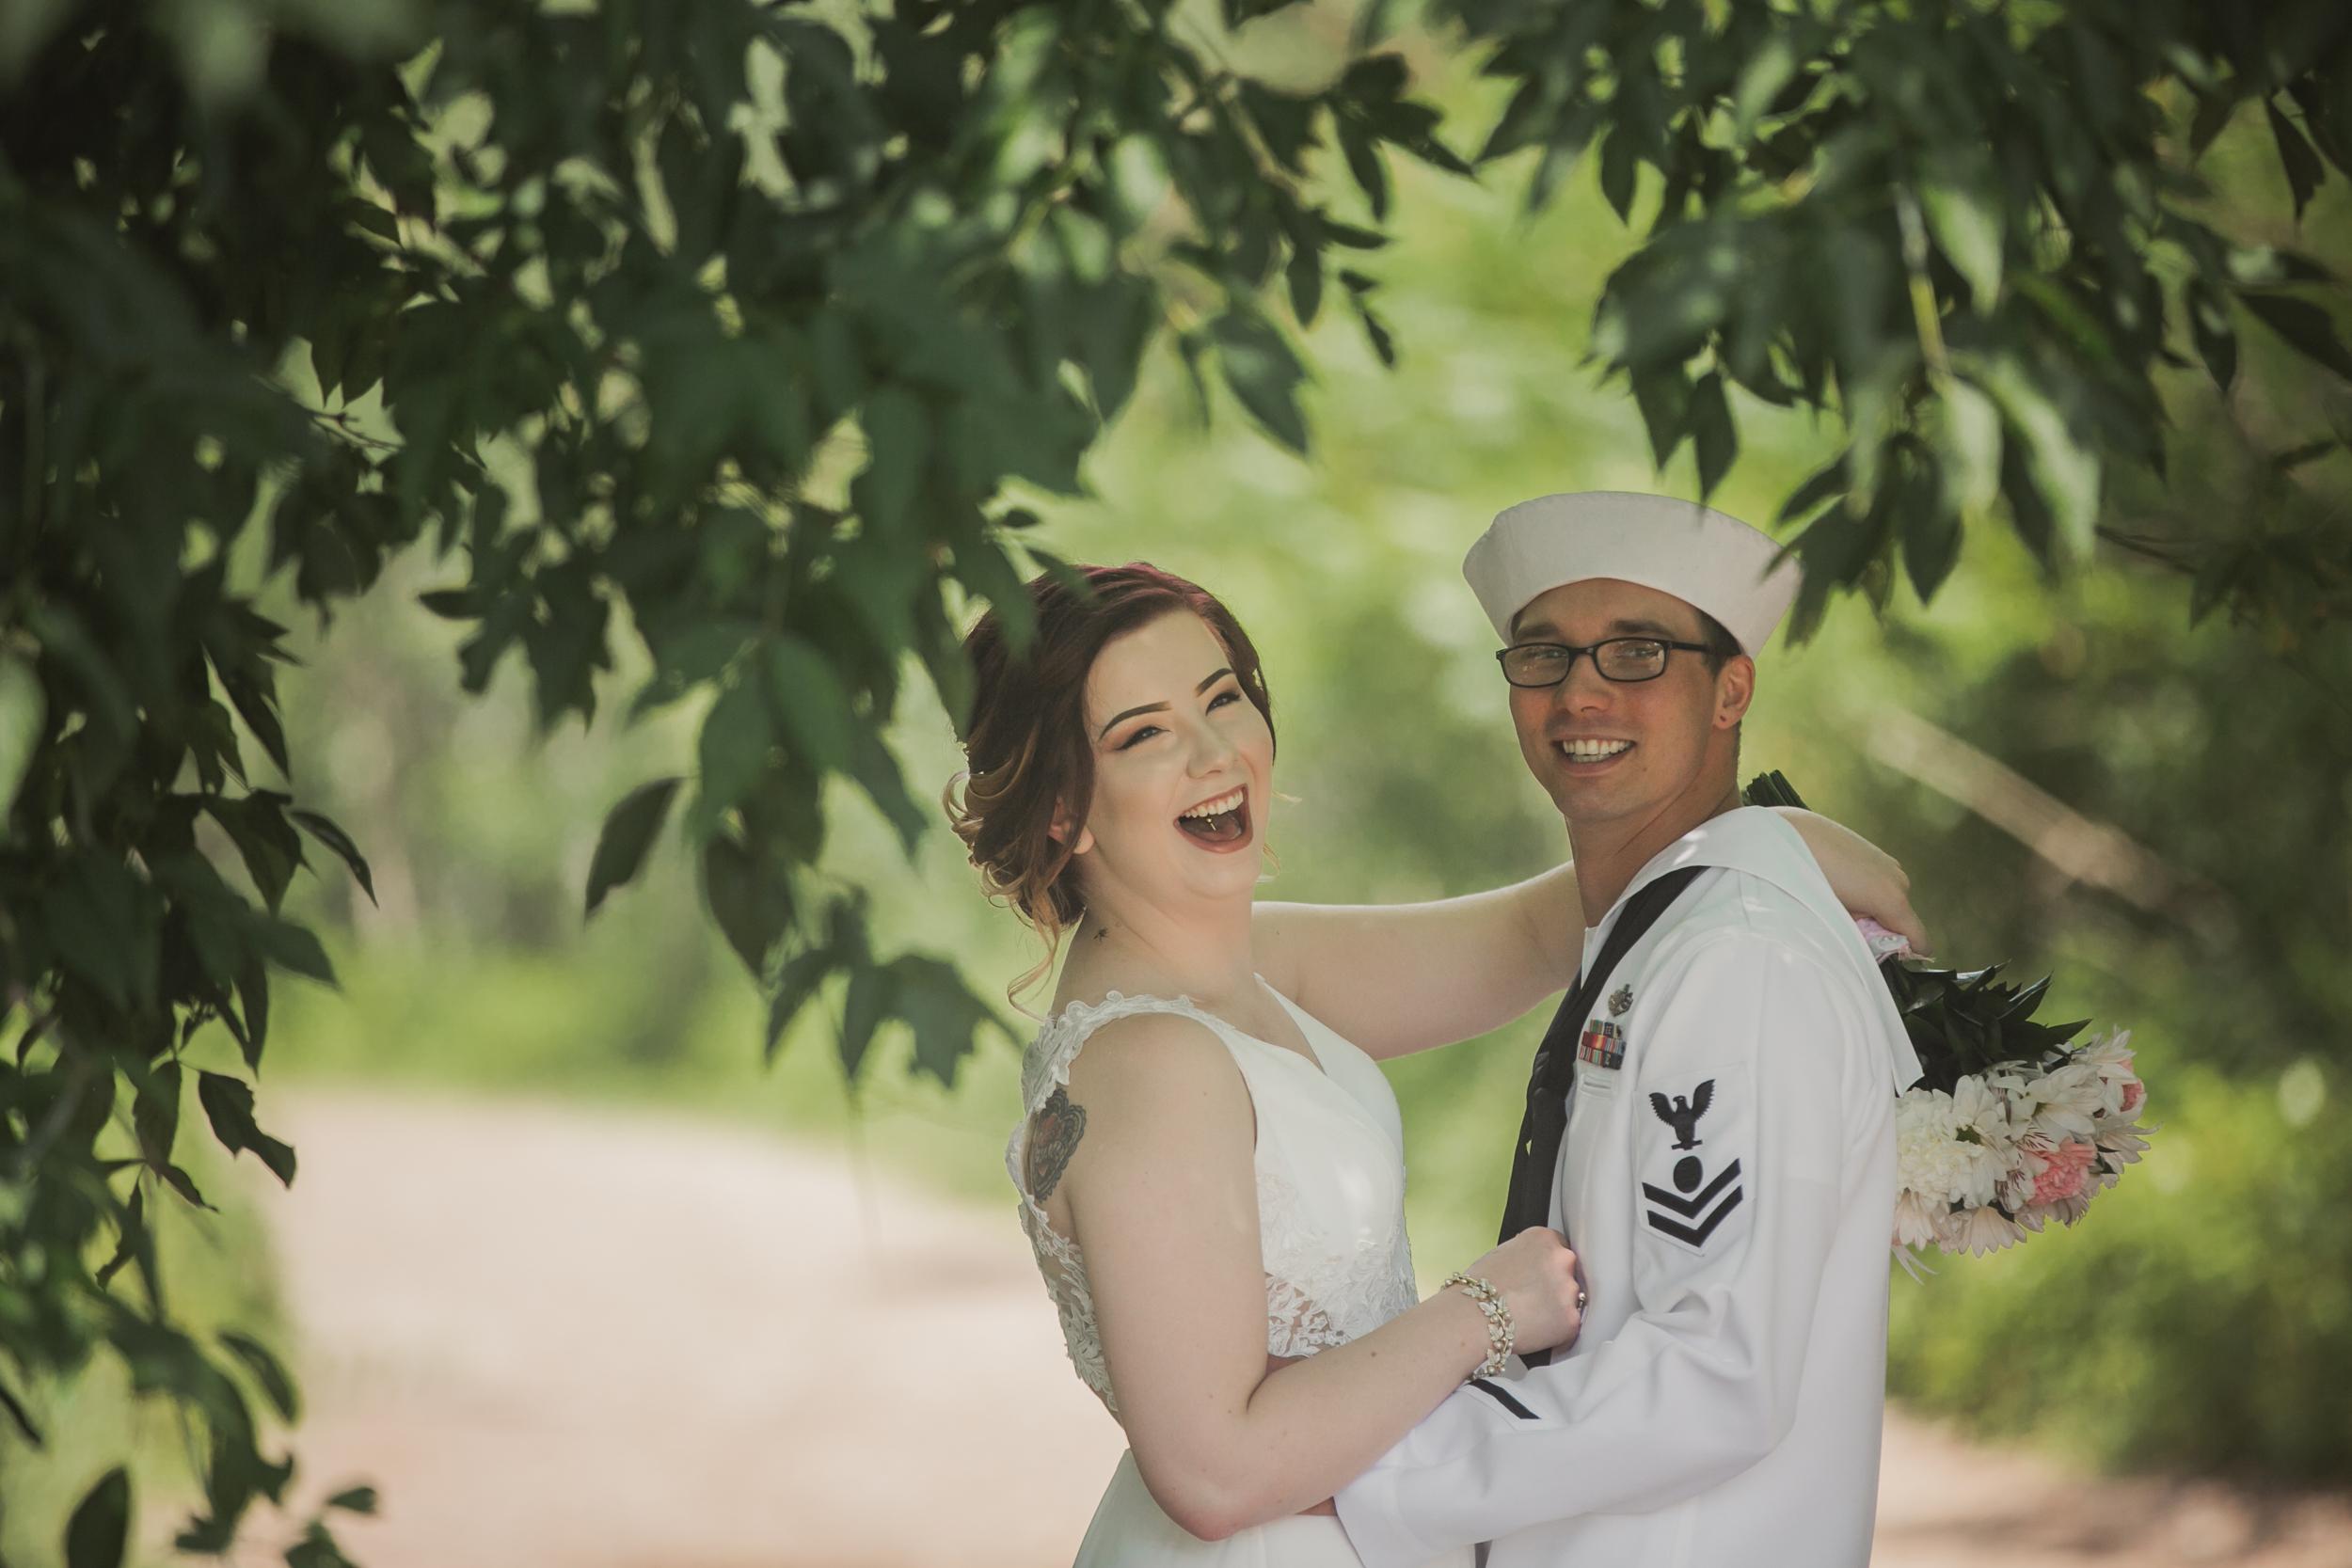 intimate elopement wedding, duluth mn, duluth mn elopement wedding, -www.rachelsmak.com15.jpg